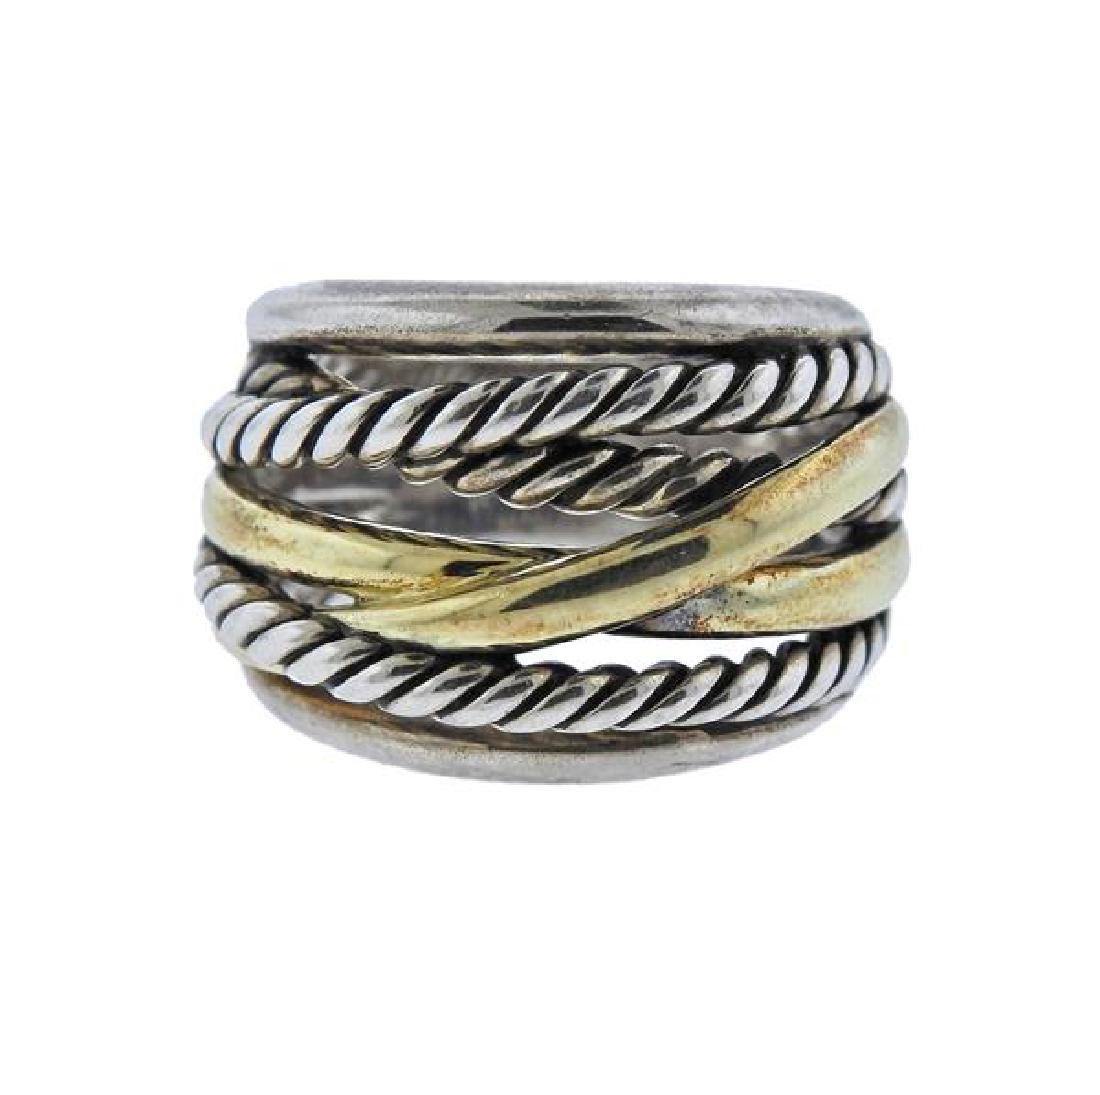 David Yurman Crossover 14k Gold Silver Ring